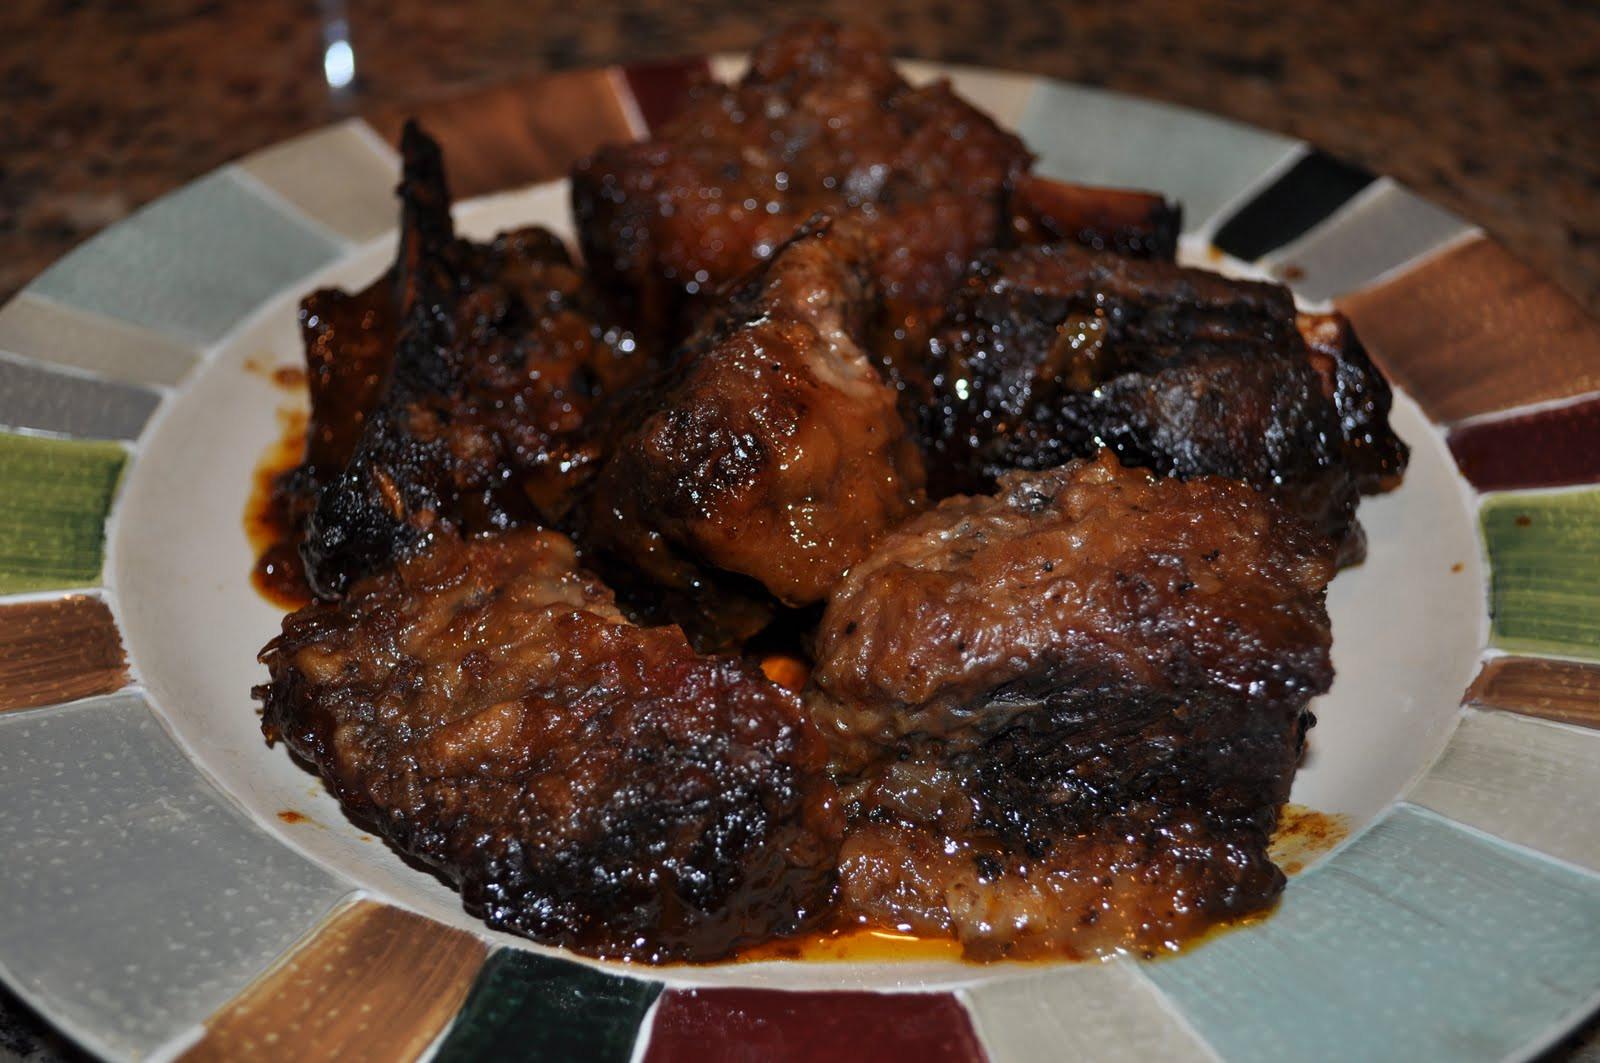 Beef Ribs Recipe Slow Cooker  Beth s Favorite Recipes Slow cooker beef ribs